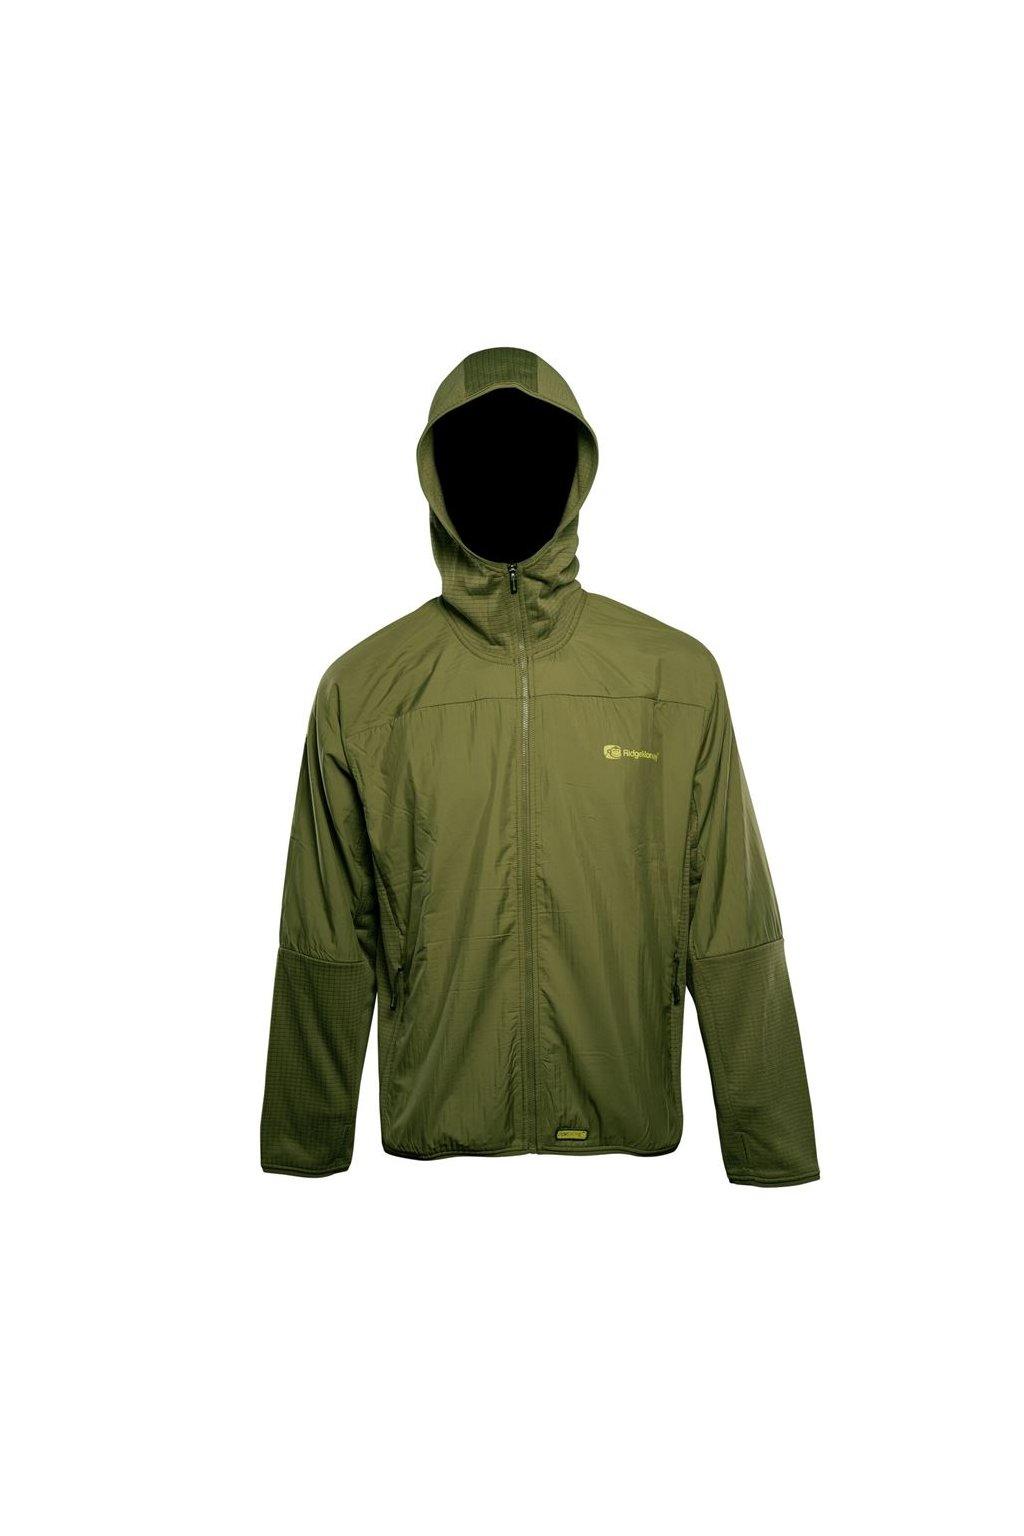 RidgeMonkey Bunda APEarel Dropback Lightweight Zip Jacket Green Velikost L